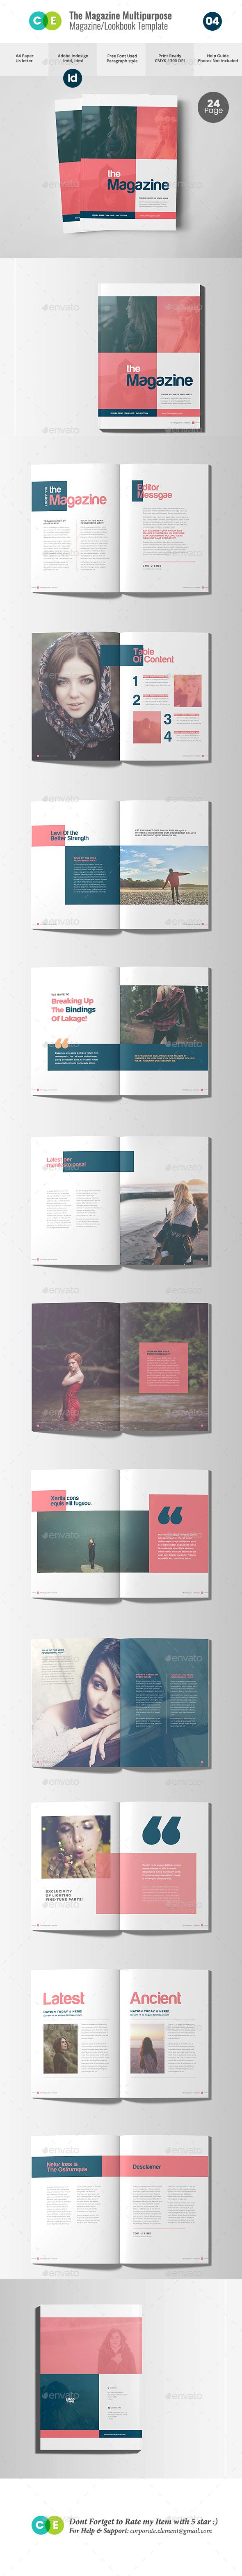 THE MAGAZINE | Multipurpose Magazine Lookbook V04 - Magazines Print Templates